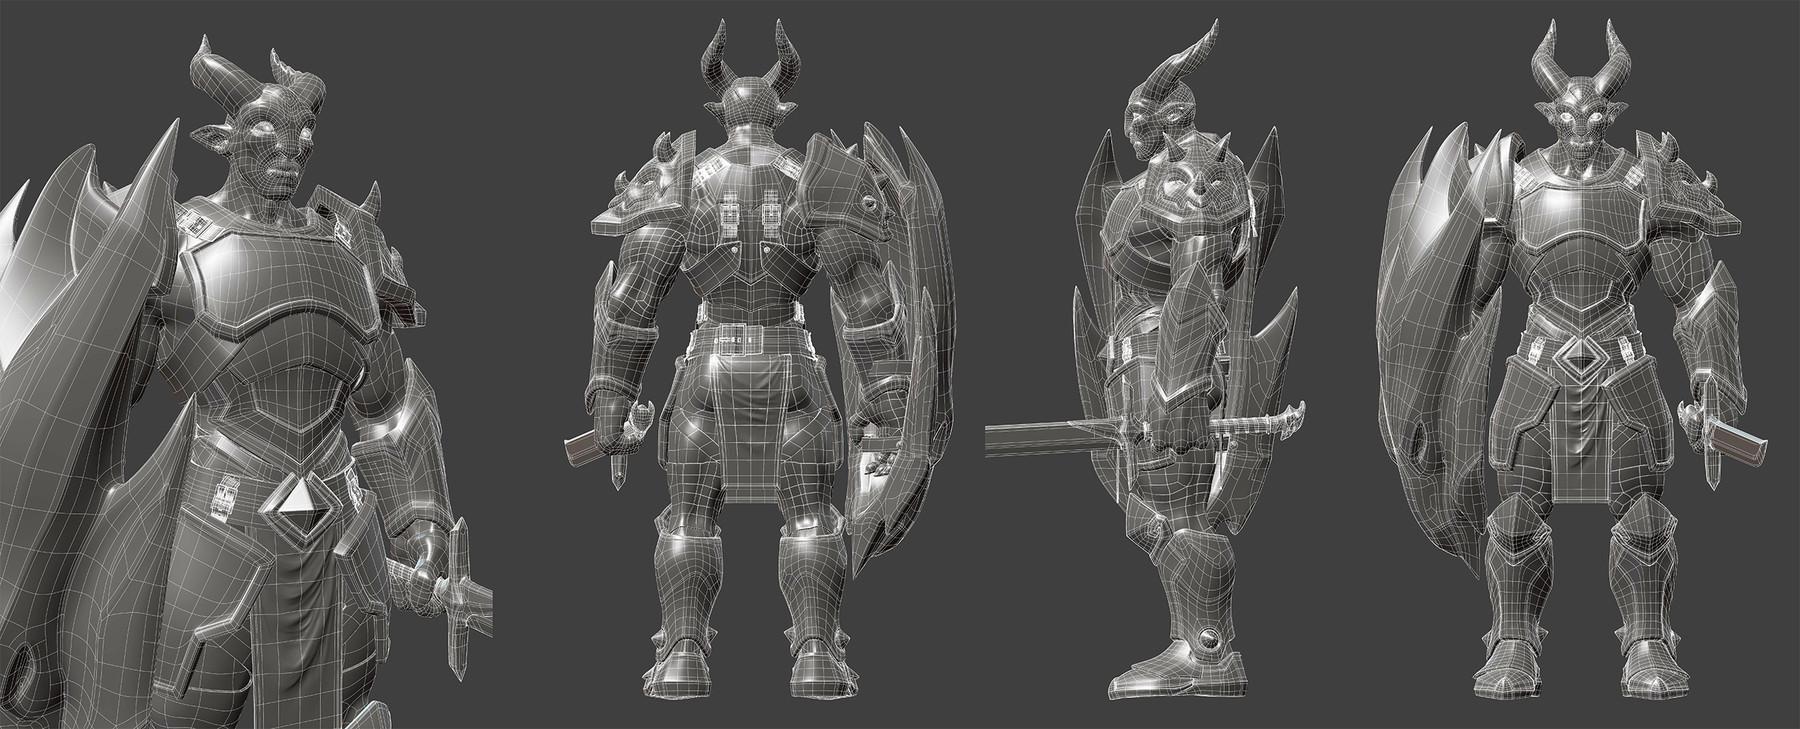 Pierrick PICAUT - Dragon Knight - Blender 3D character